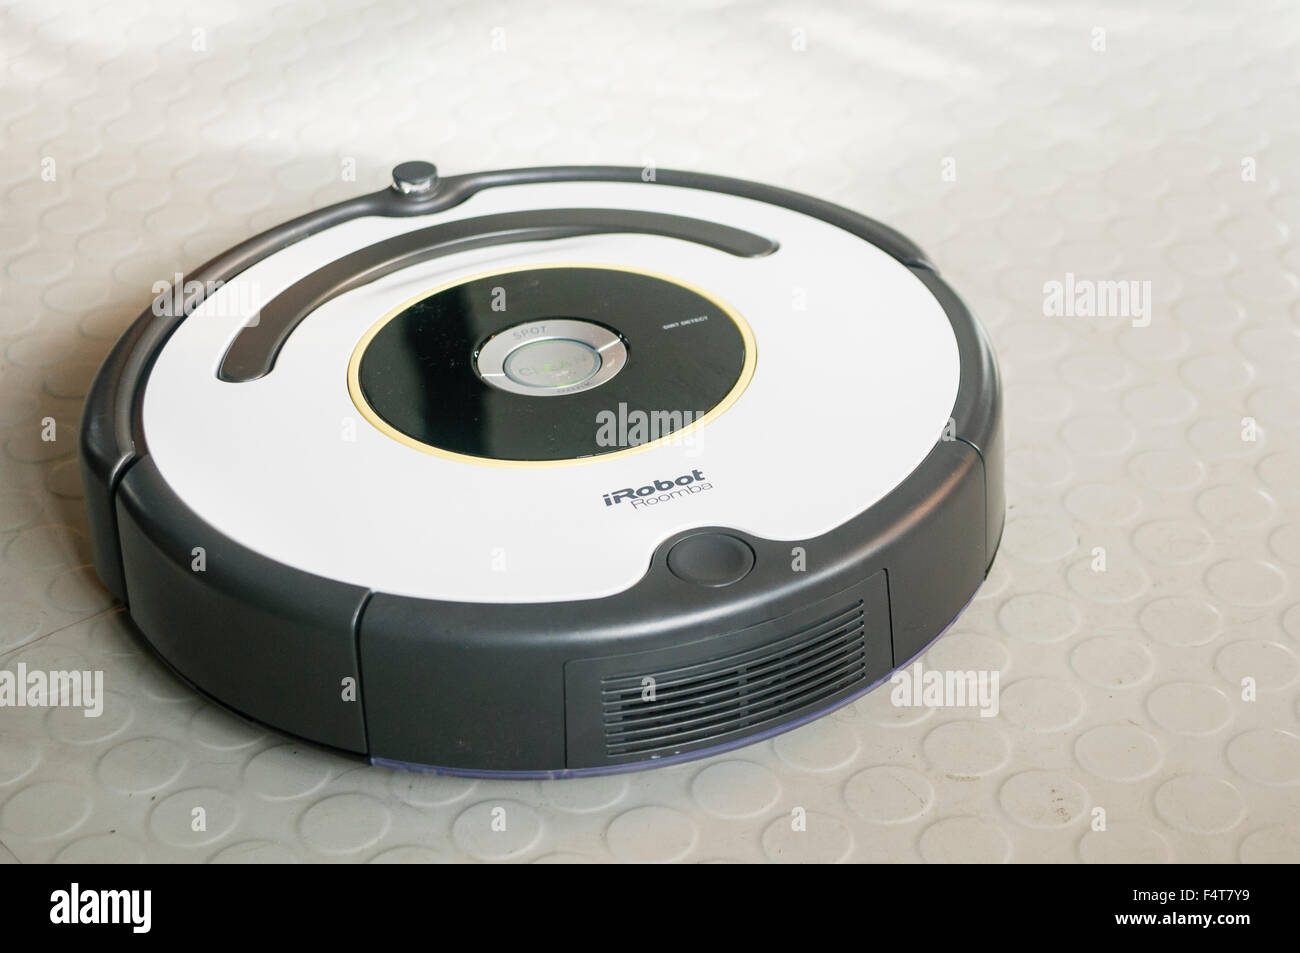 An iRobot Roomba robotic vacuum cleaner cleaning a rubber vinyl kitchen floor - Stock Image